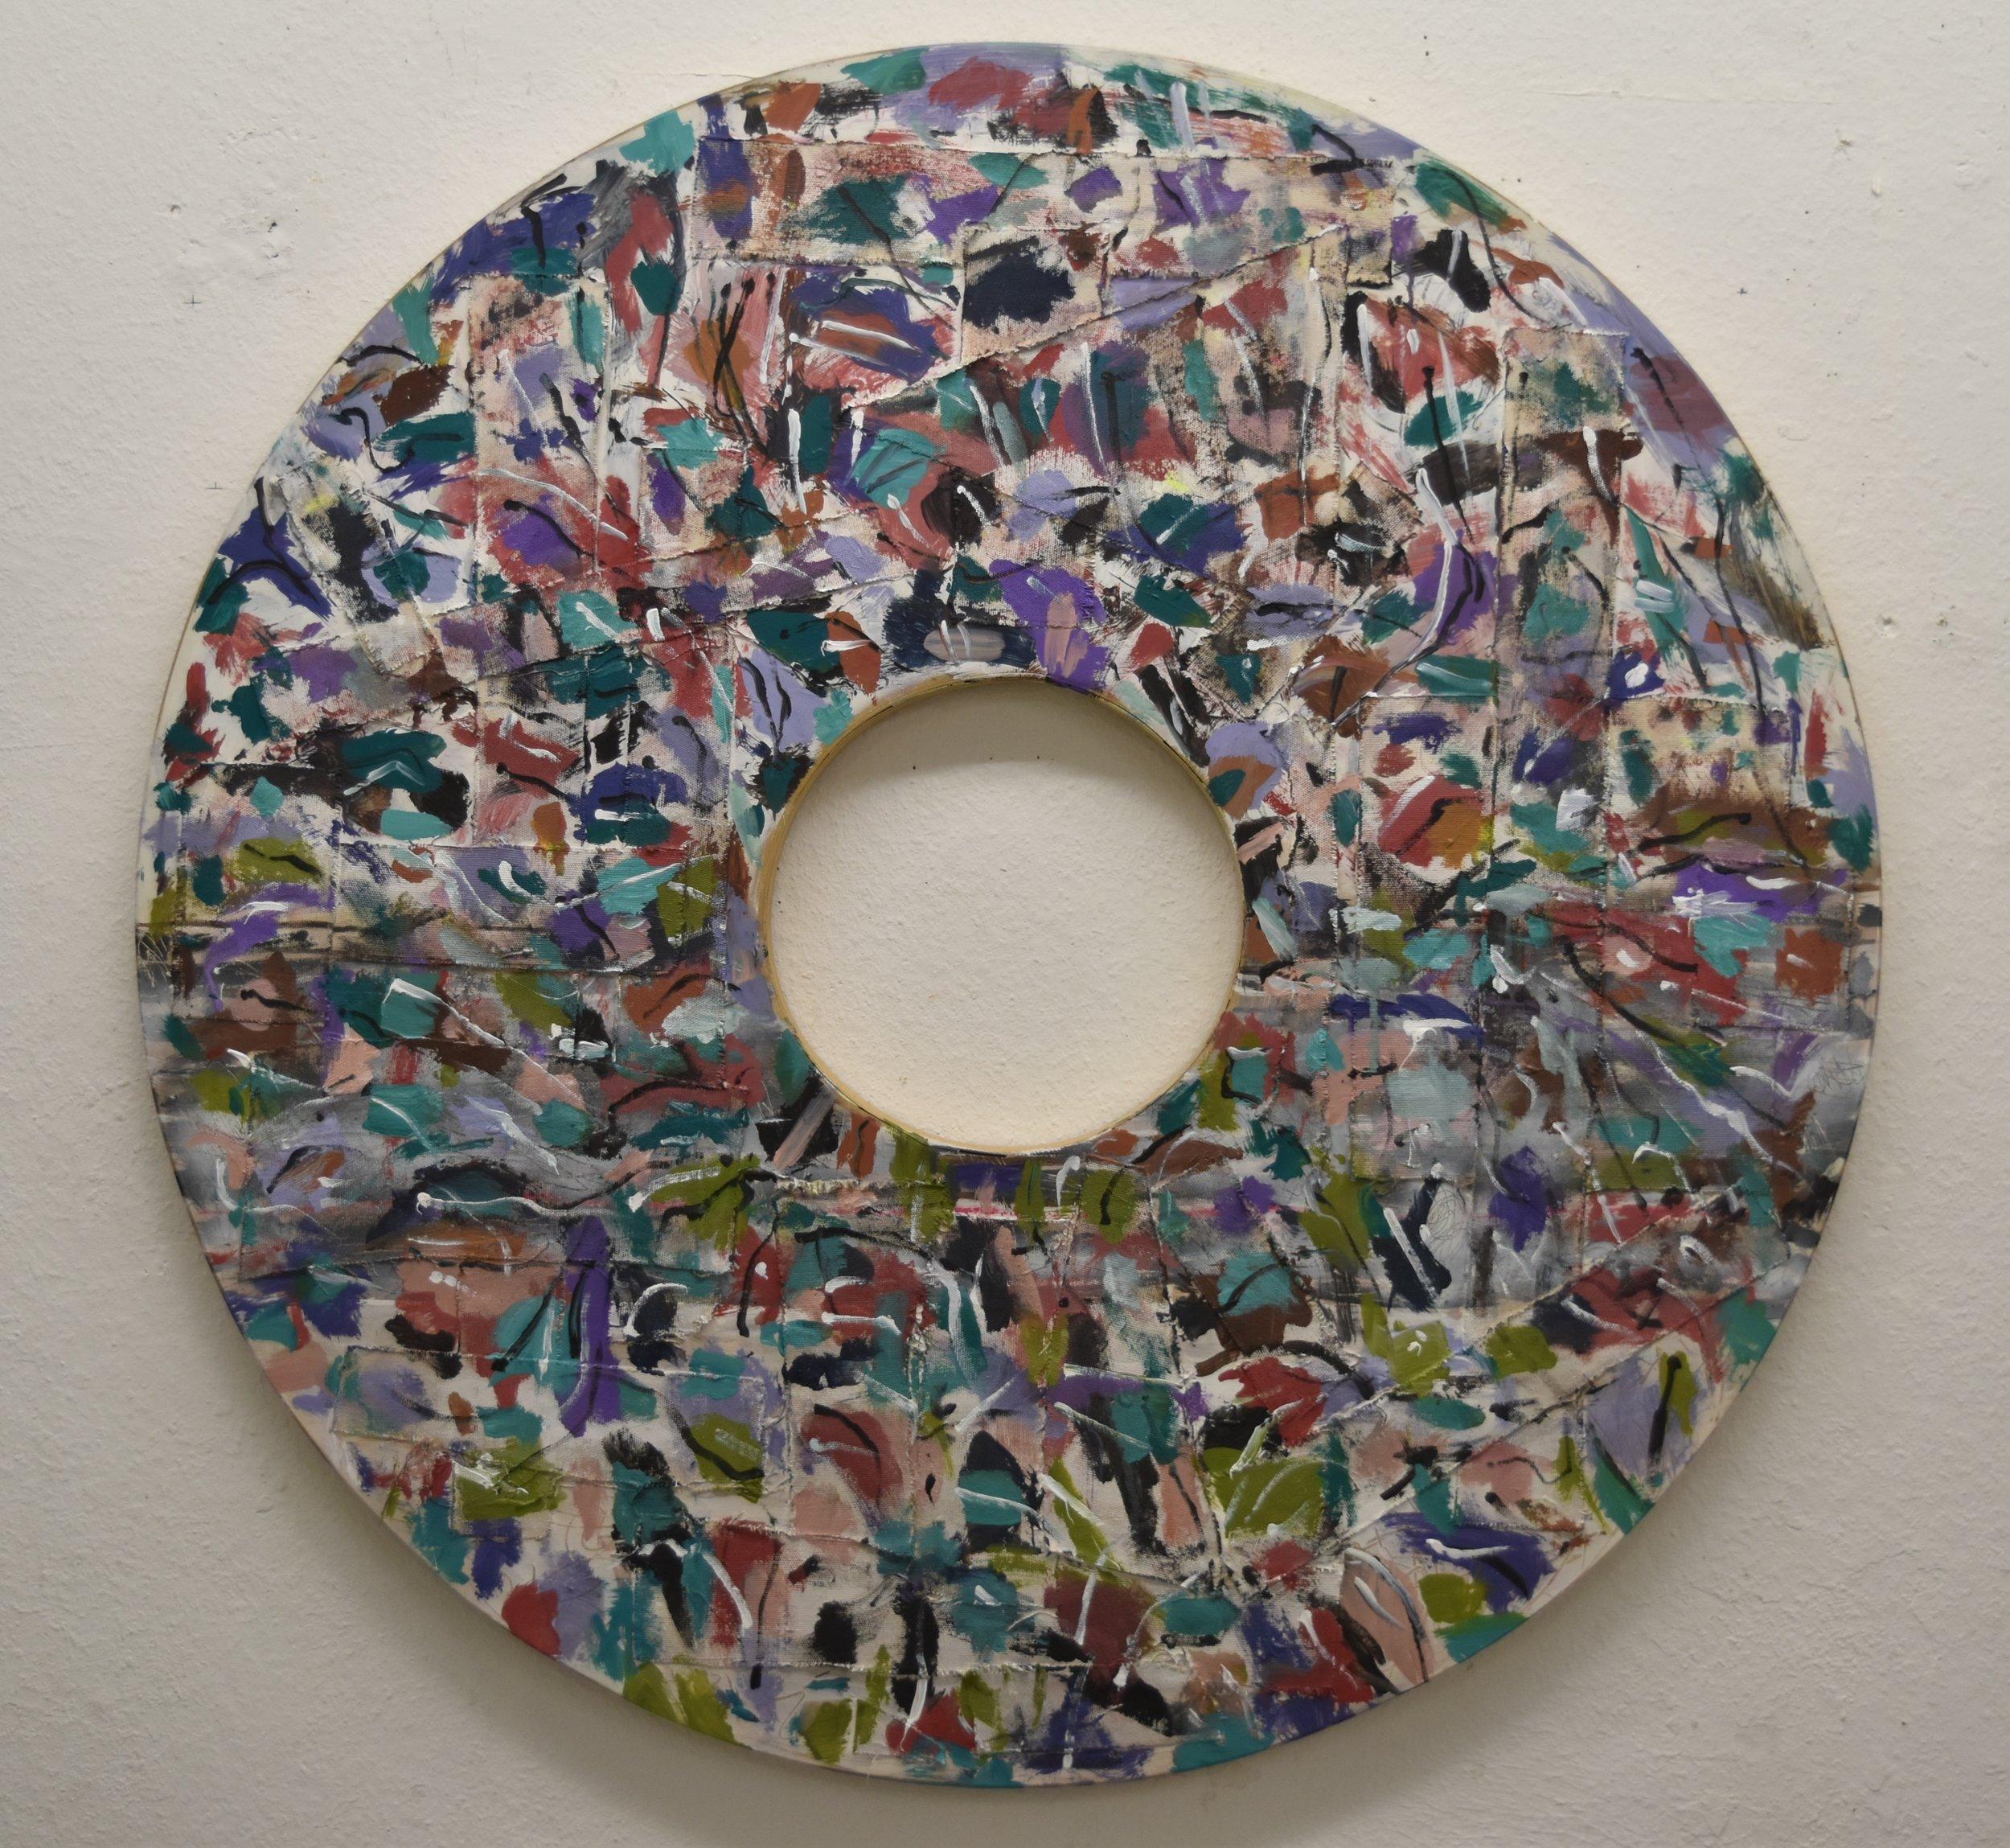 Acrylic on wood  110cm diameter 43in d